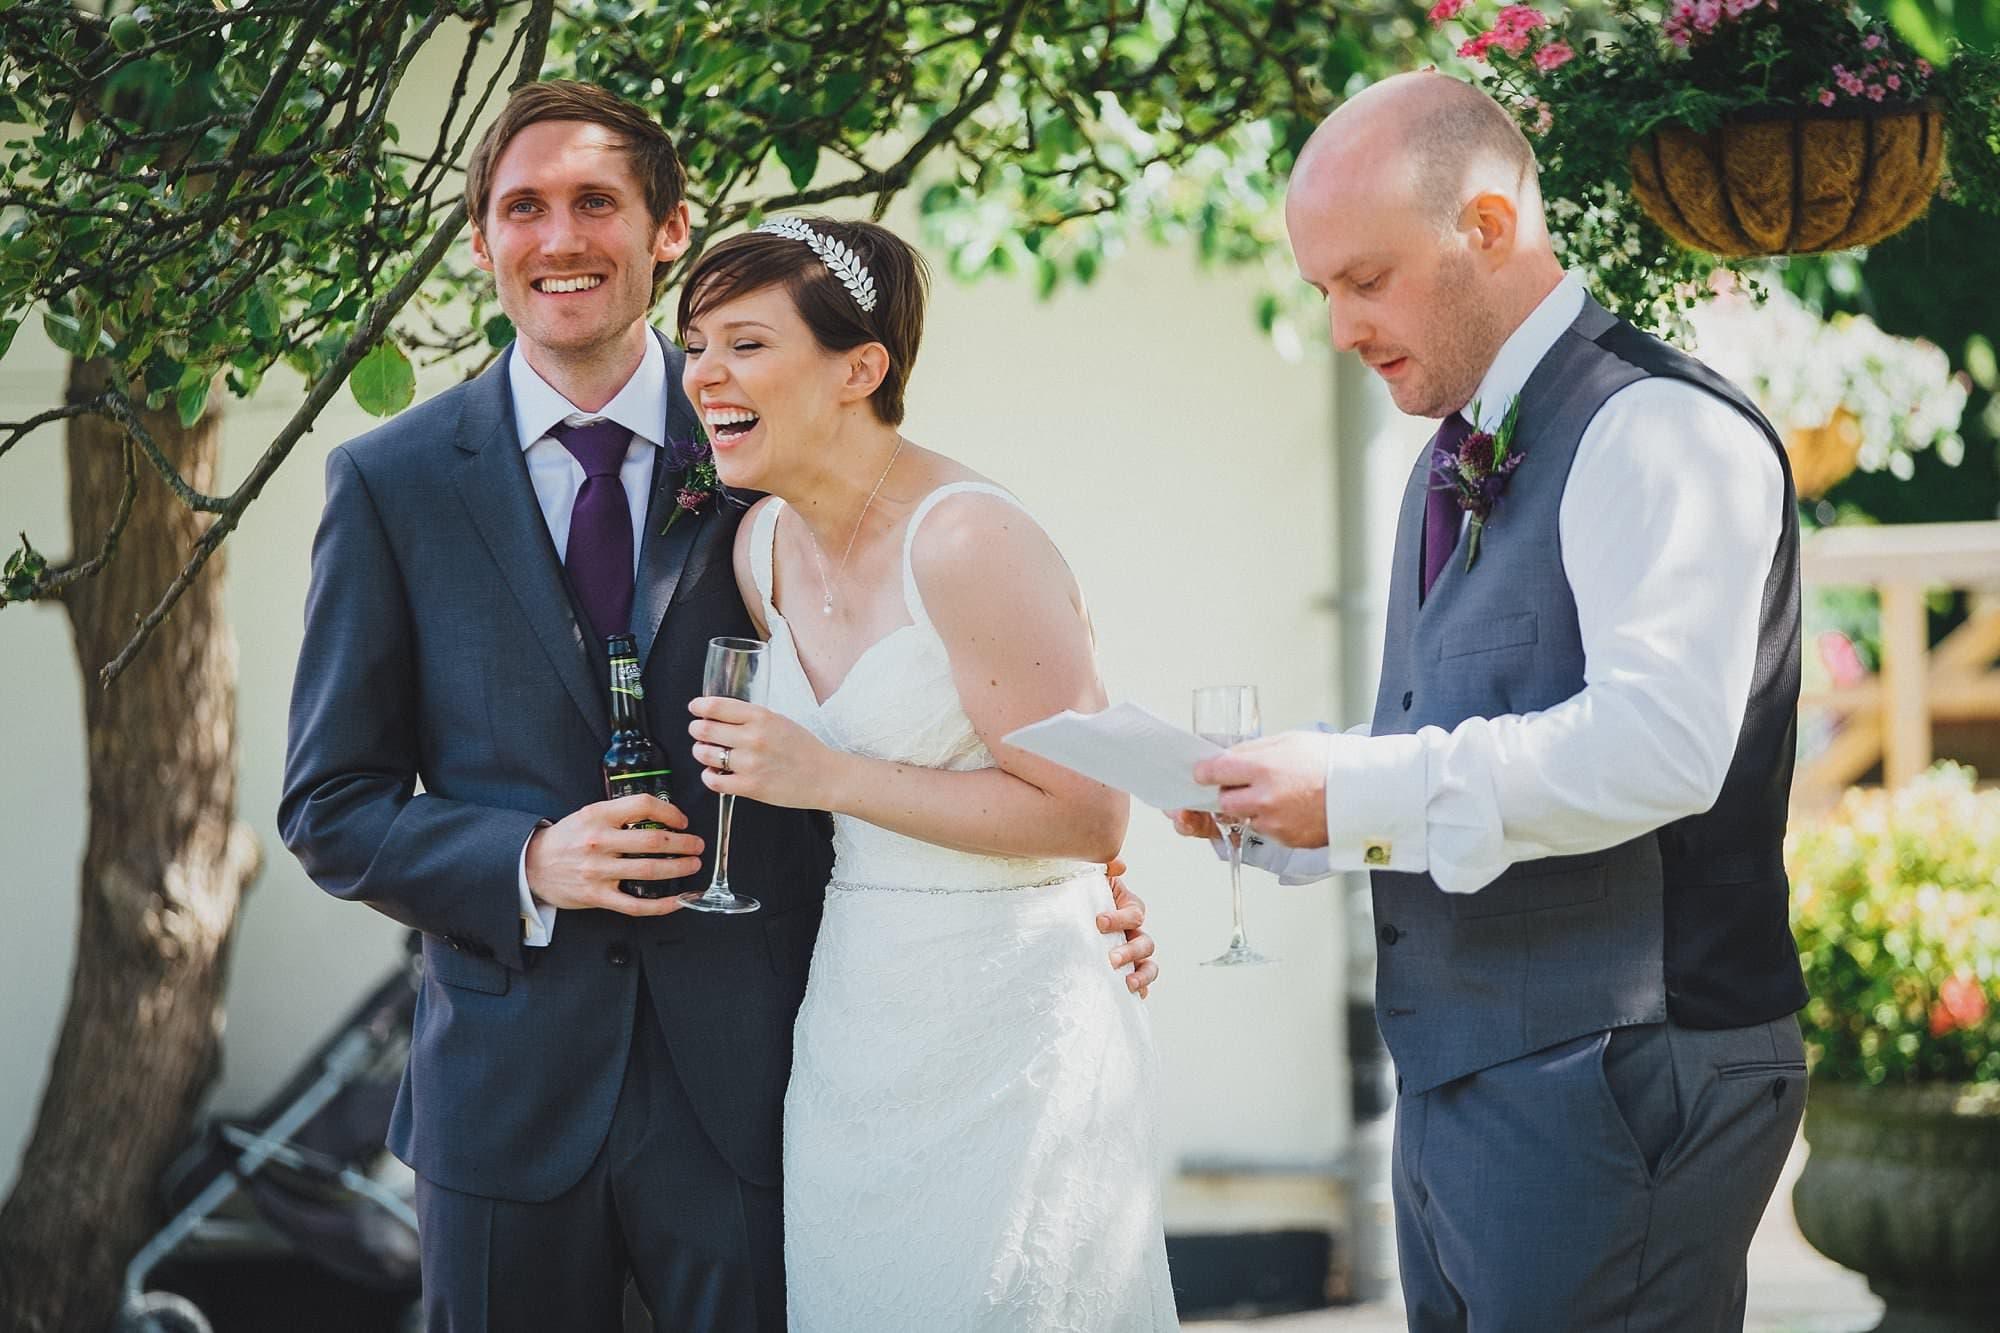 oaks farm wedding photographer cj 072 - Cat + Jake   Oaks Farm Wedding Photography